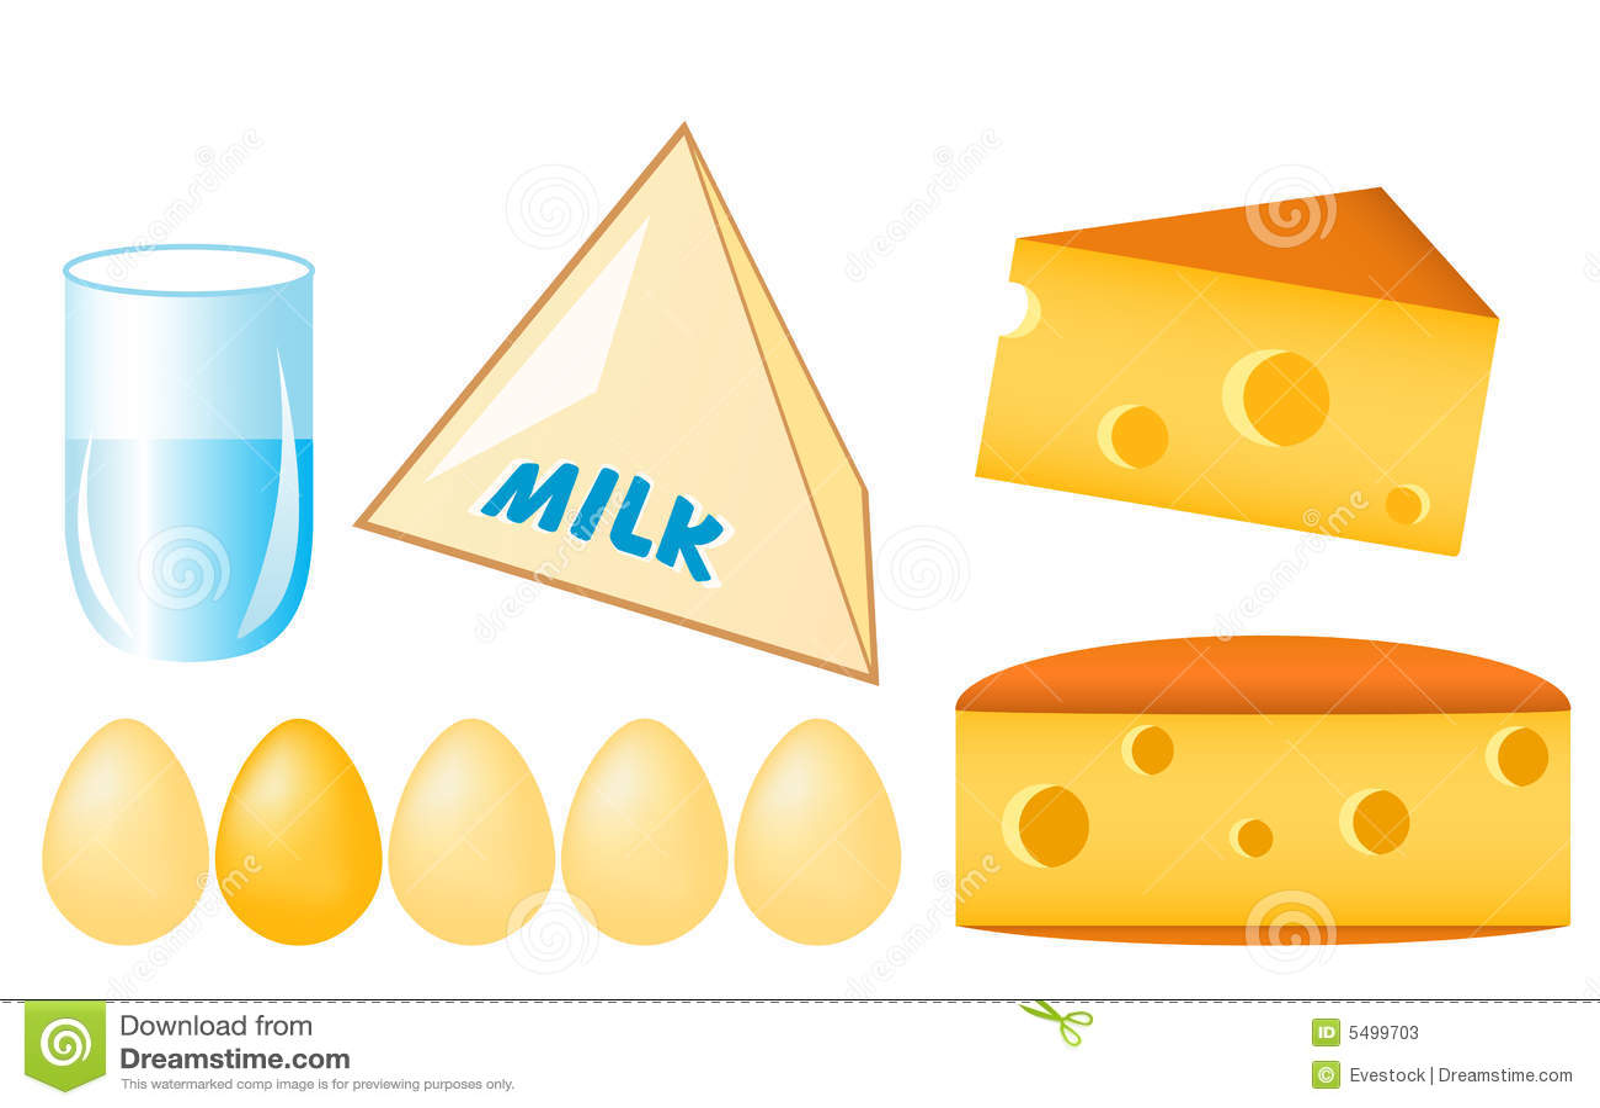 food clip art stock vector illustration of drink golden 5499703 rh dreamstime com foot clipart images food clipart free download